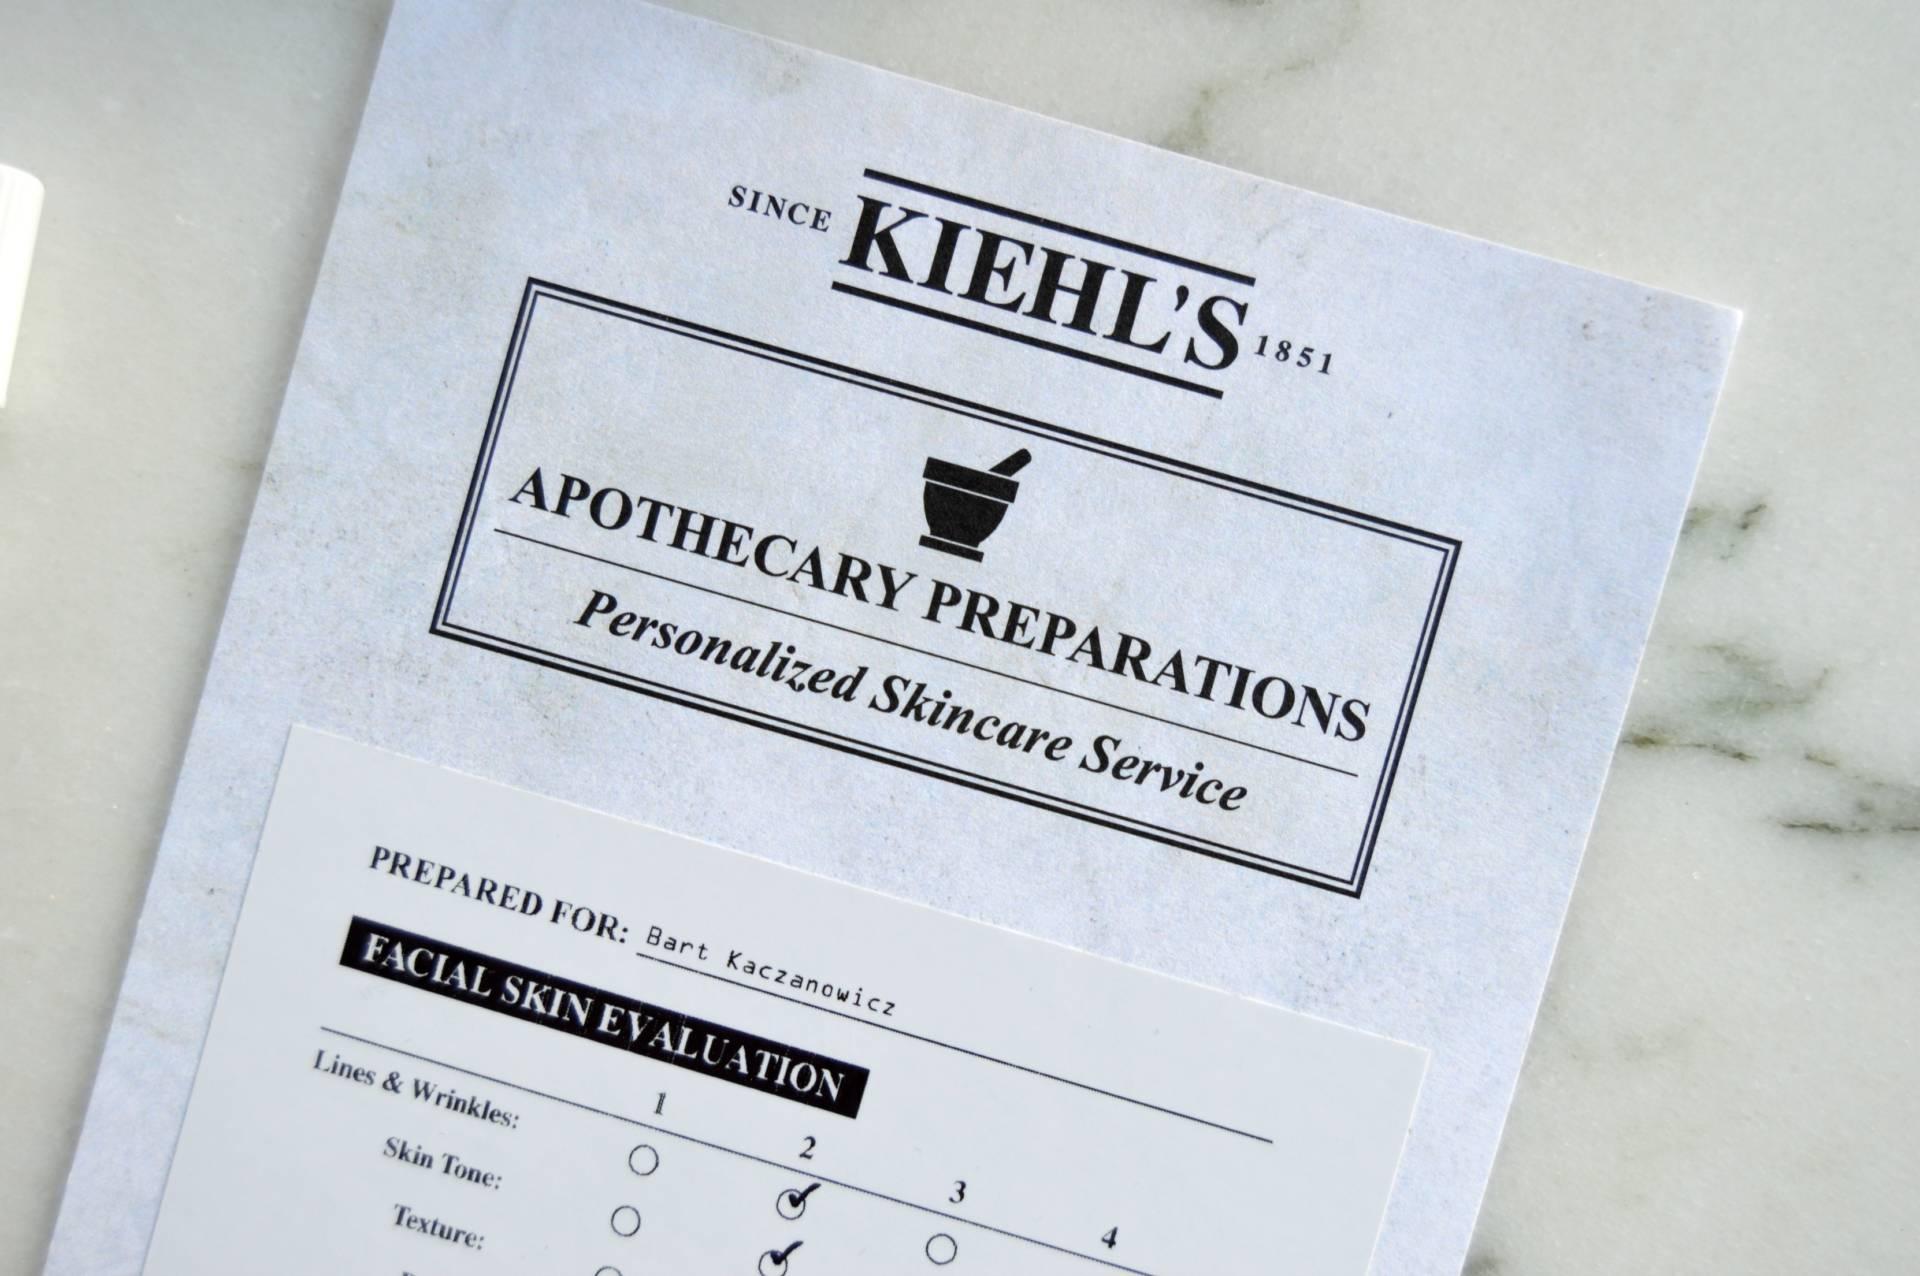 kiehls-bart-personalized-skincare-service-inhautepursuit